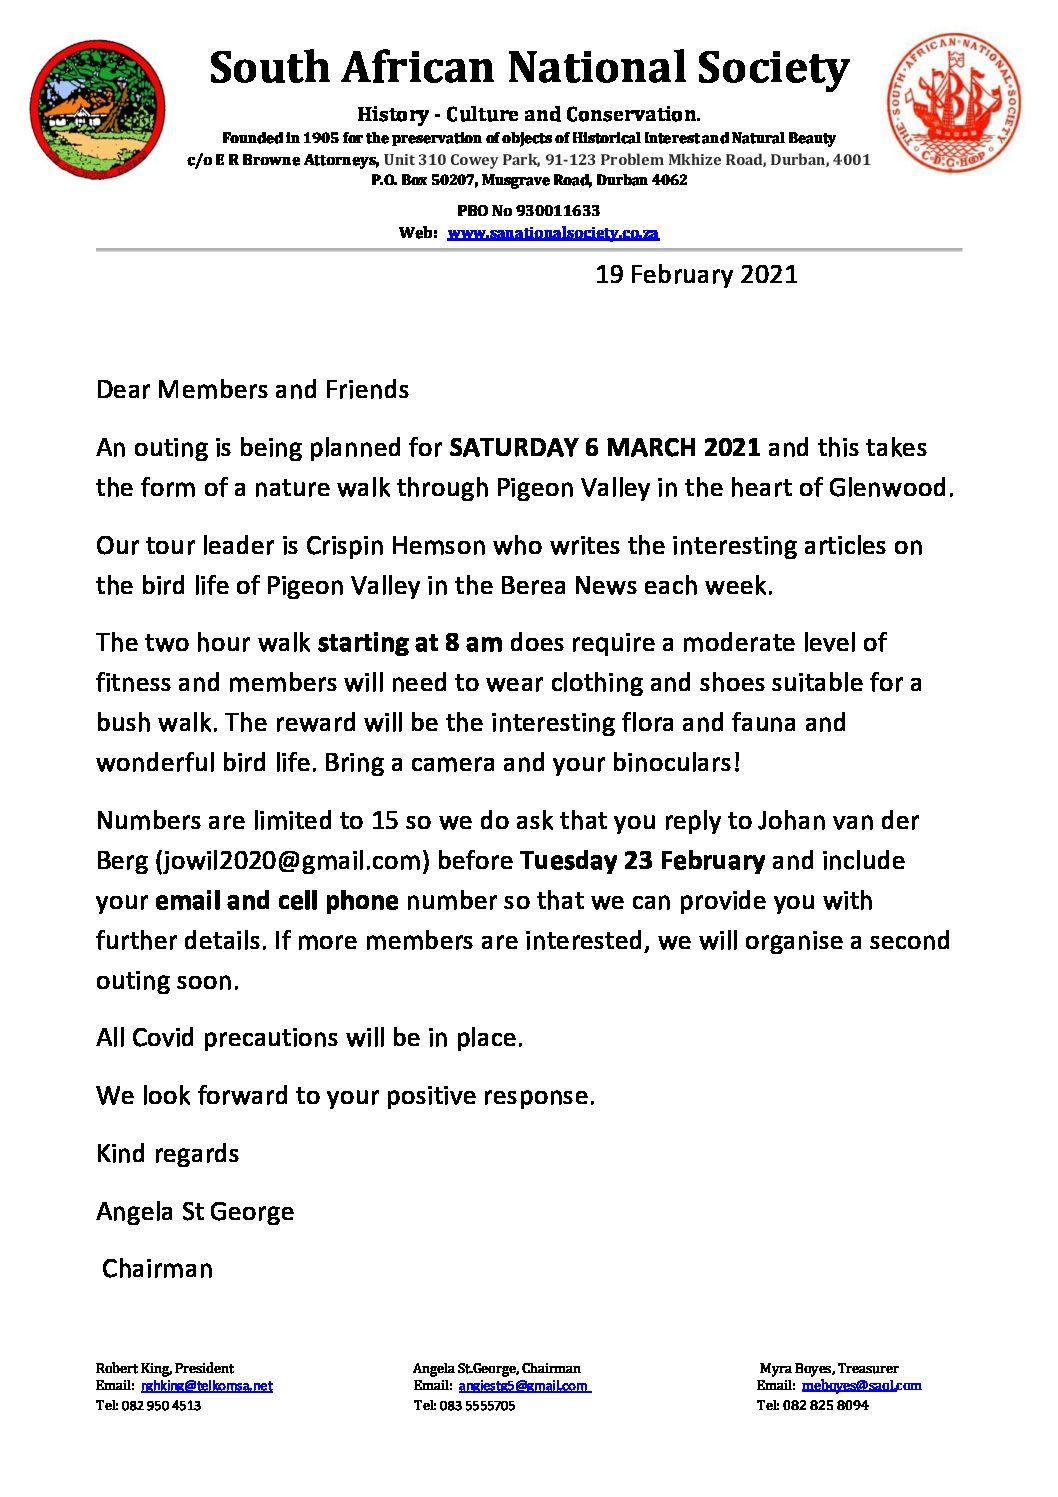 SANS – Visit to Pigeon Valley – Saturday 6 March 2021.